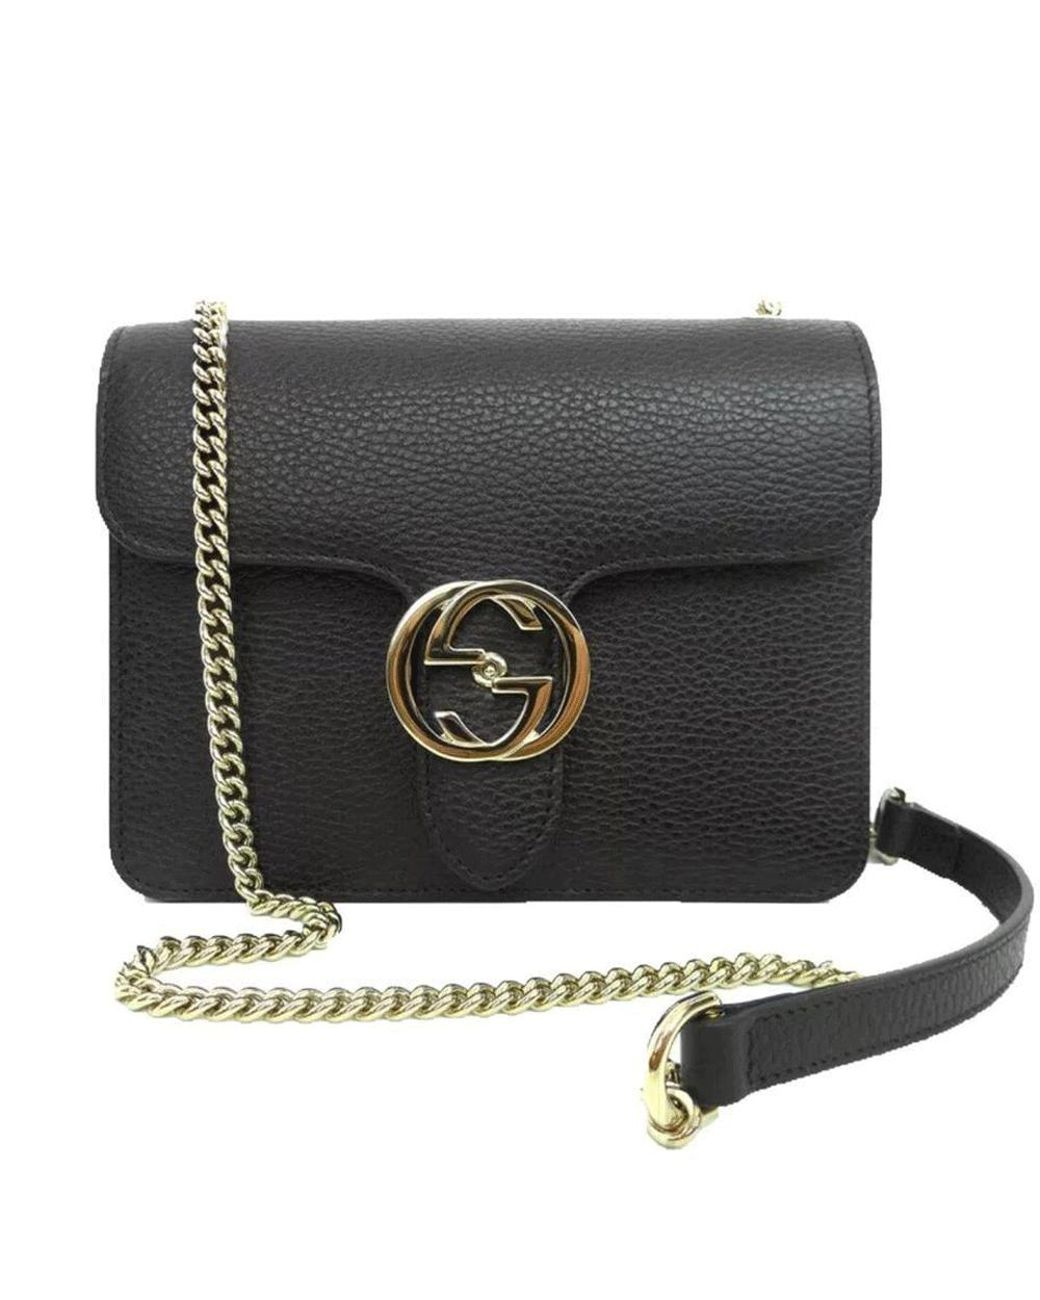 6e6b77d6 Women's Black Leather Marmont Interlocking GG Crossbody Bag